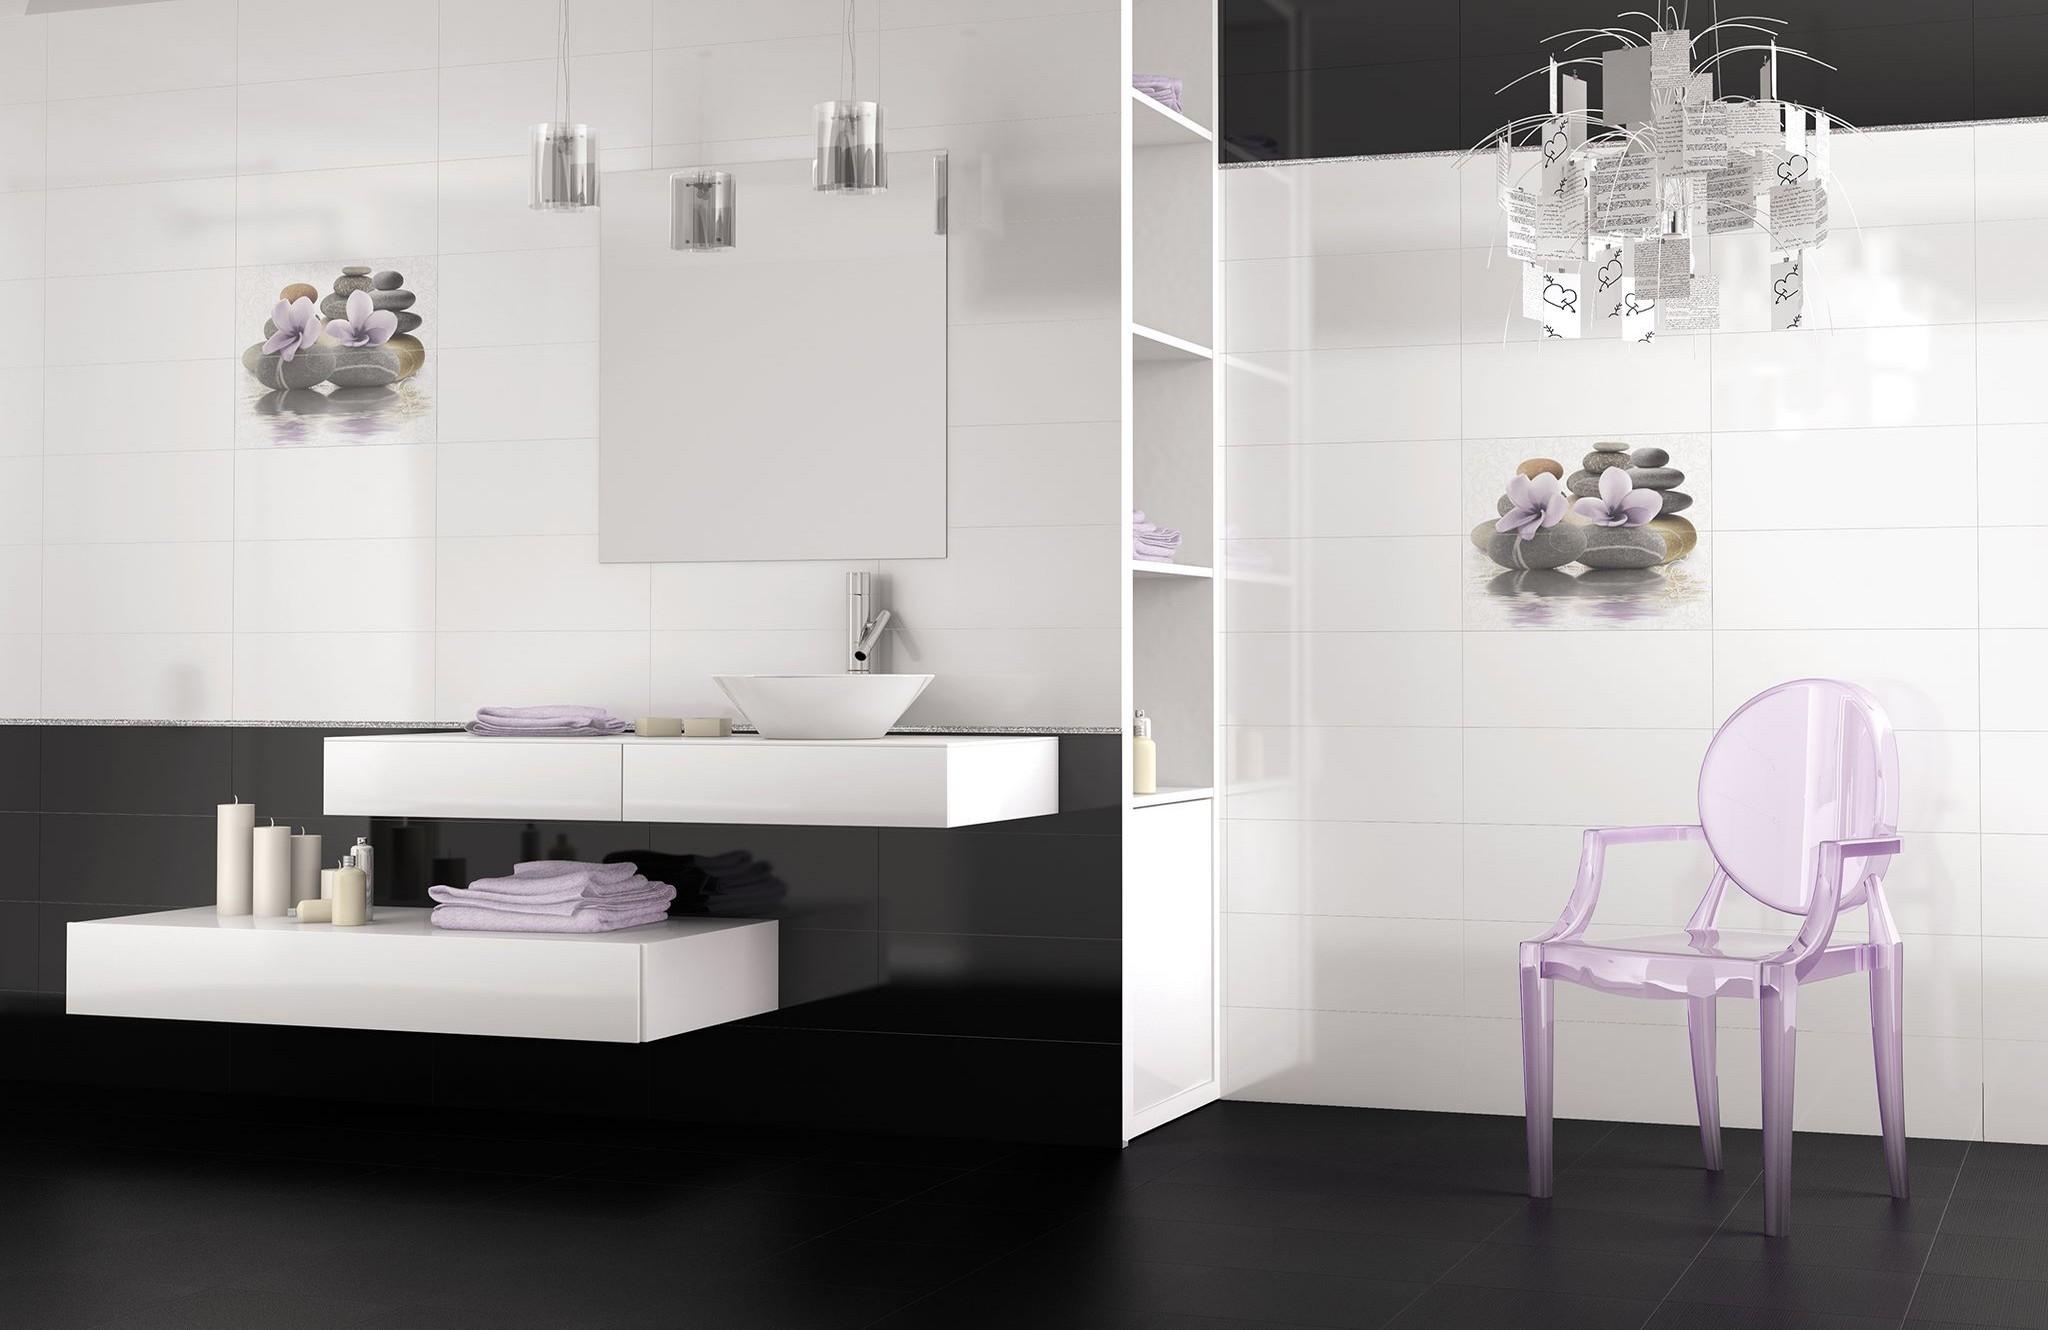 faience salle de bain cifre serie intensity 20x50 1 choix carrelage fa ence salle de bain. Black Bedroom Furniture Sets. Home Design Ideas